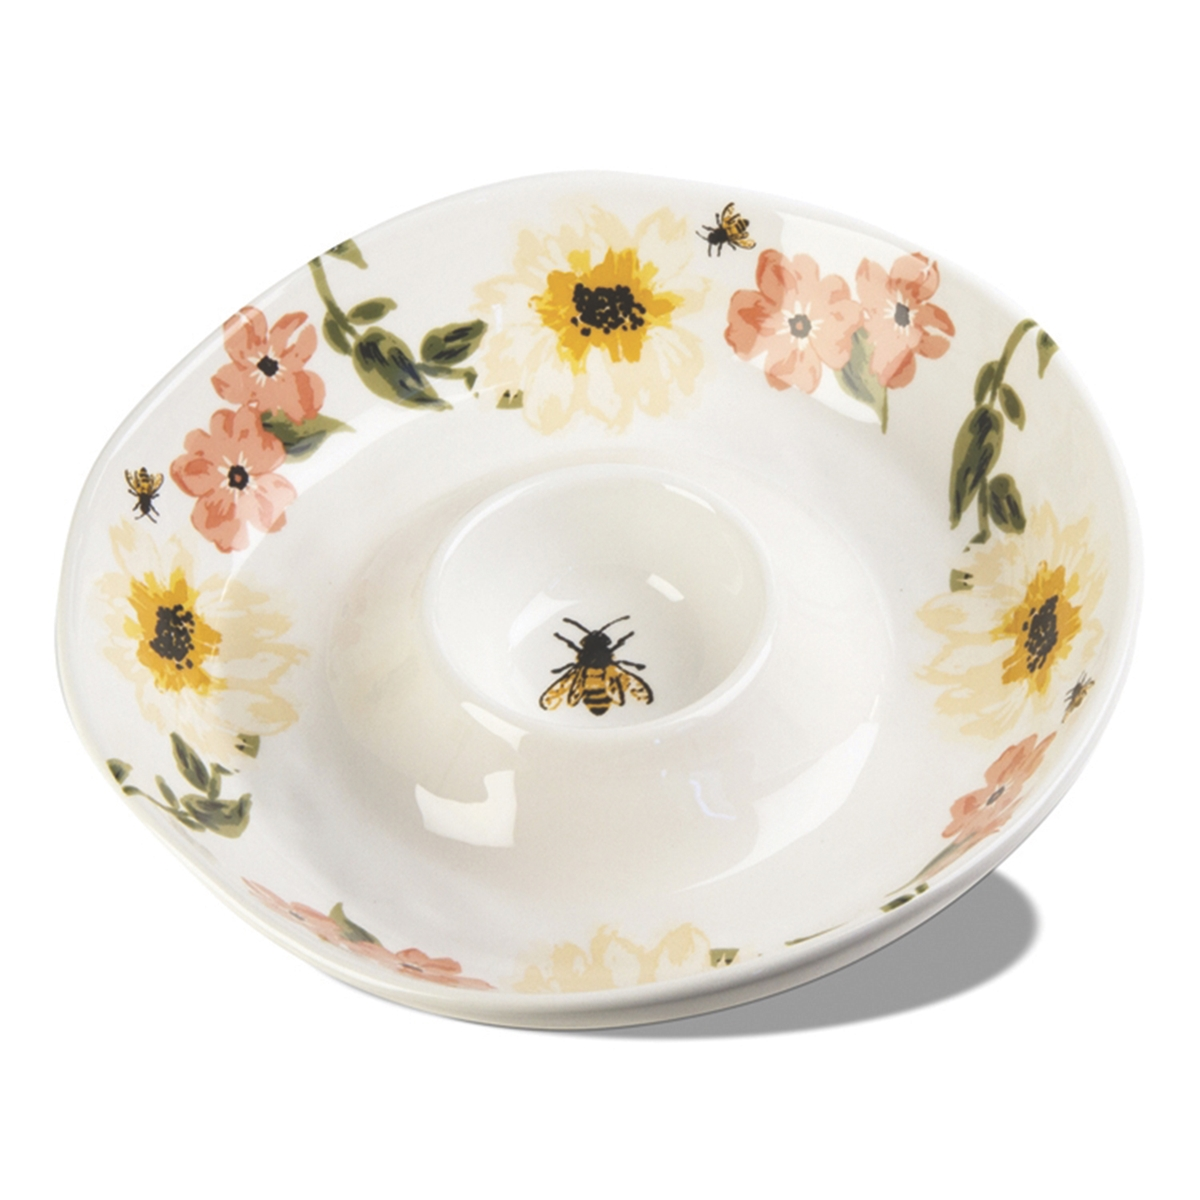 Honeybee Serving Bowl